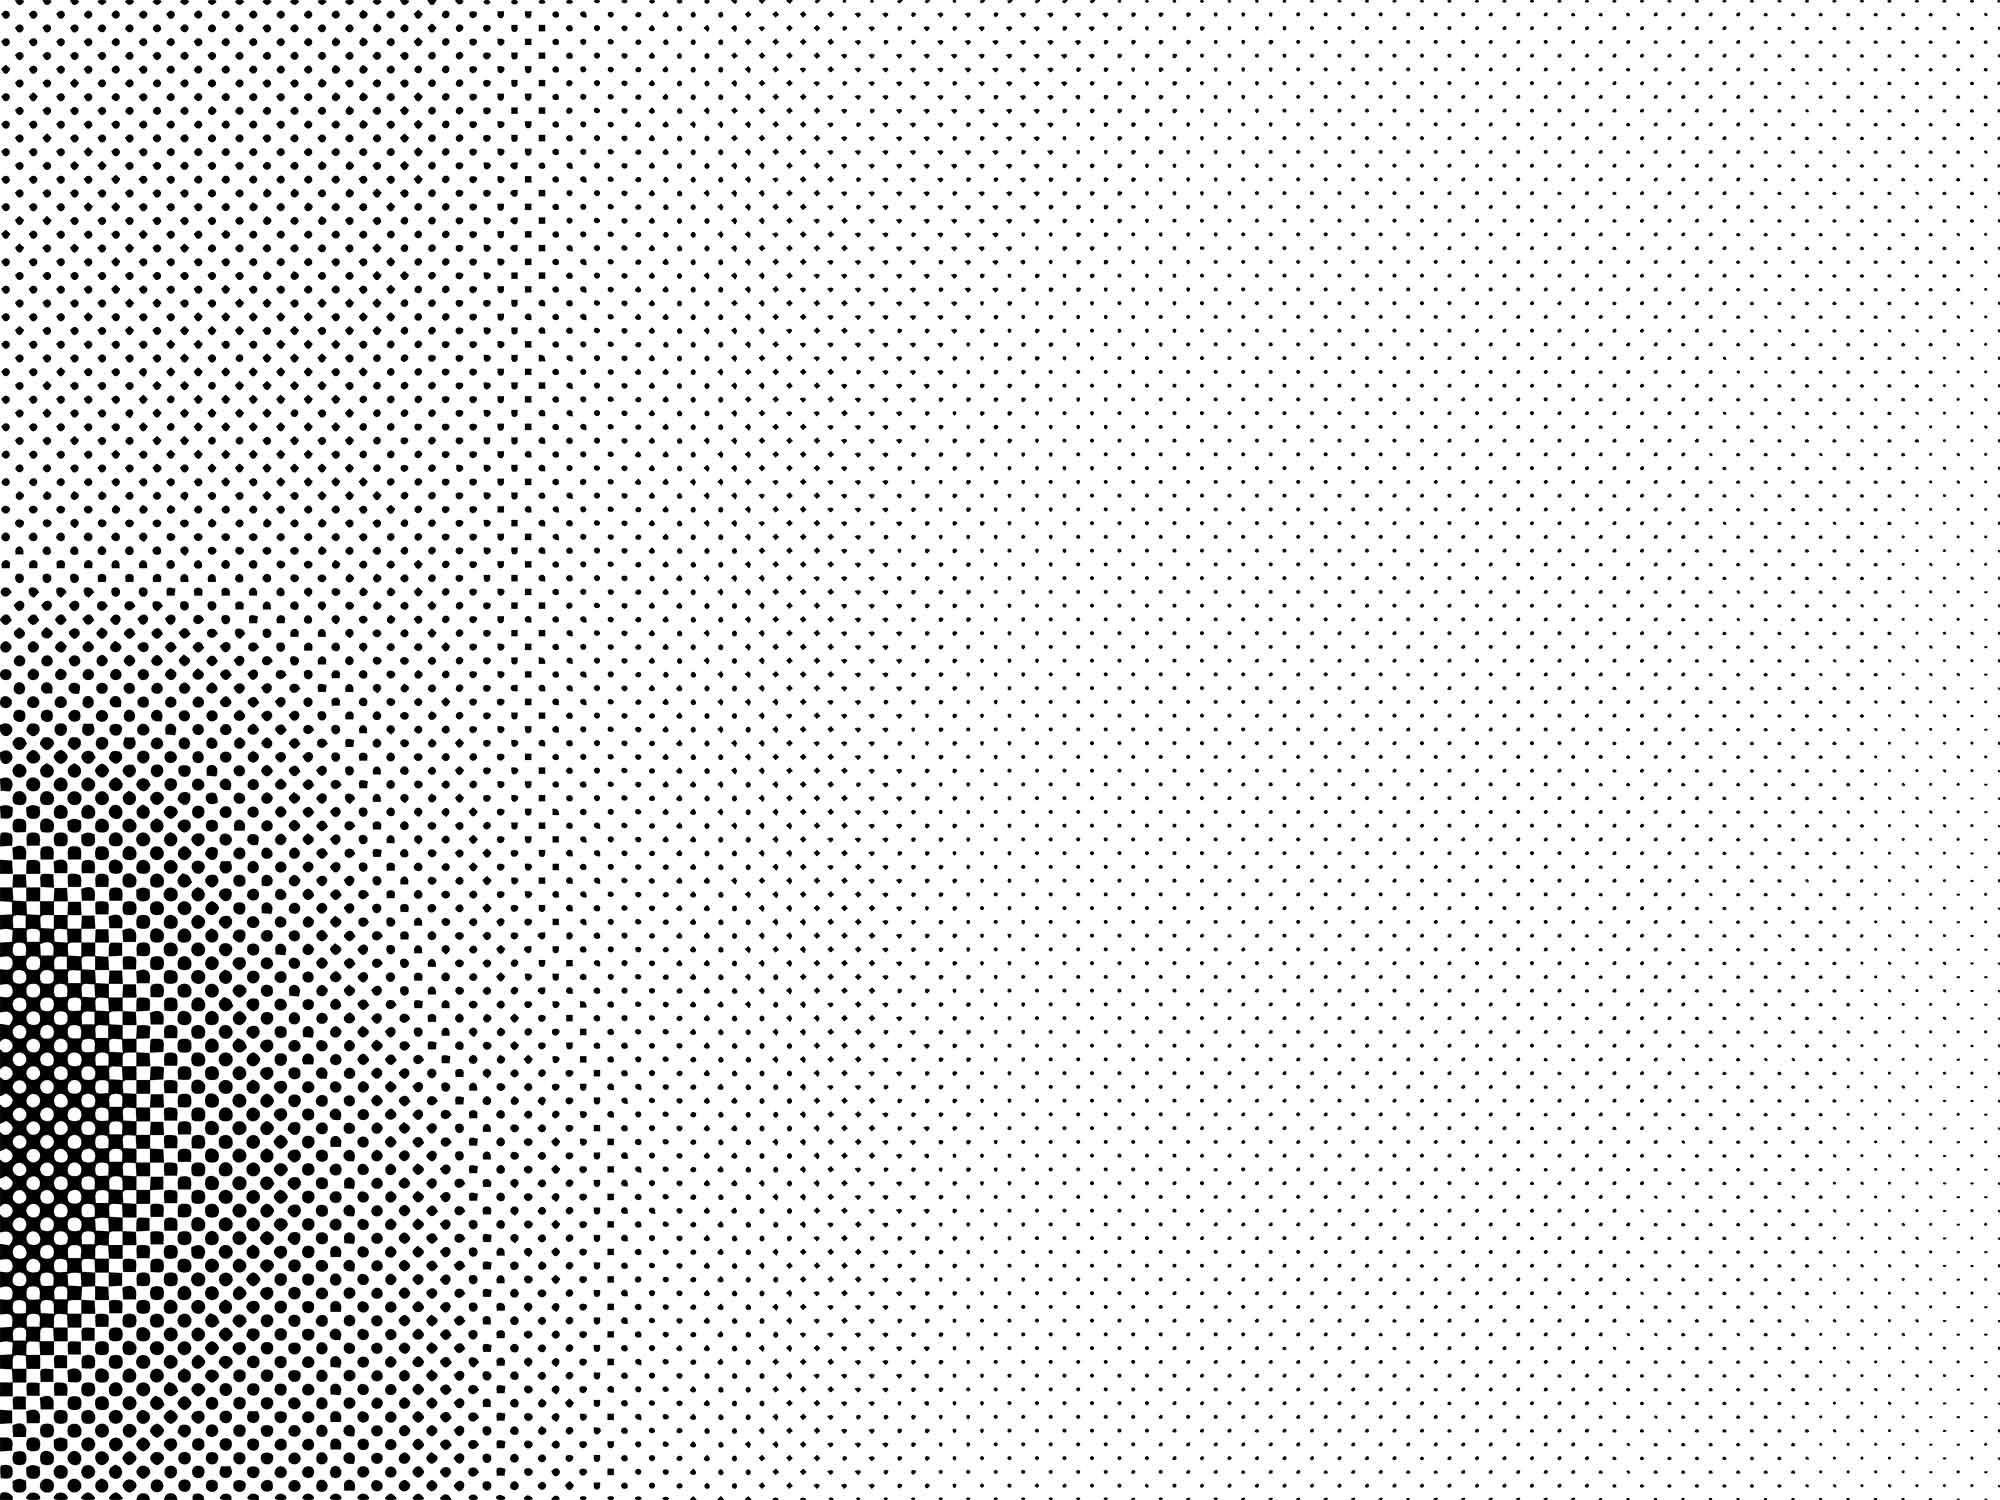 Halftone Dot Textures 3